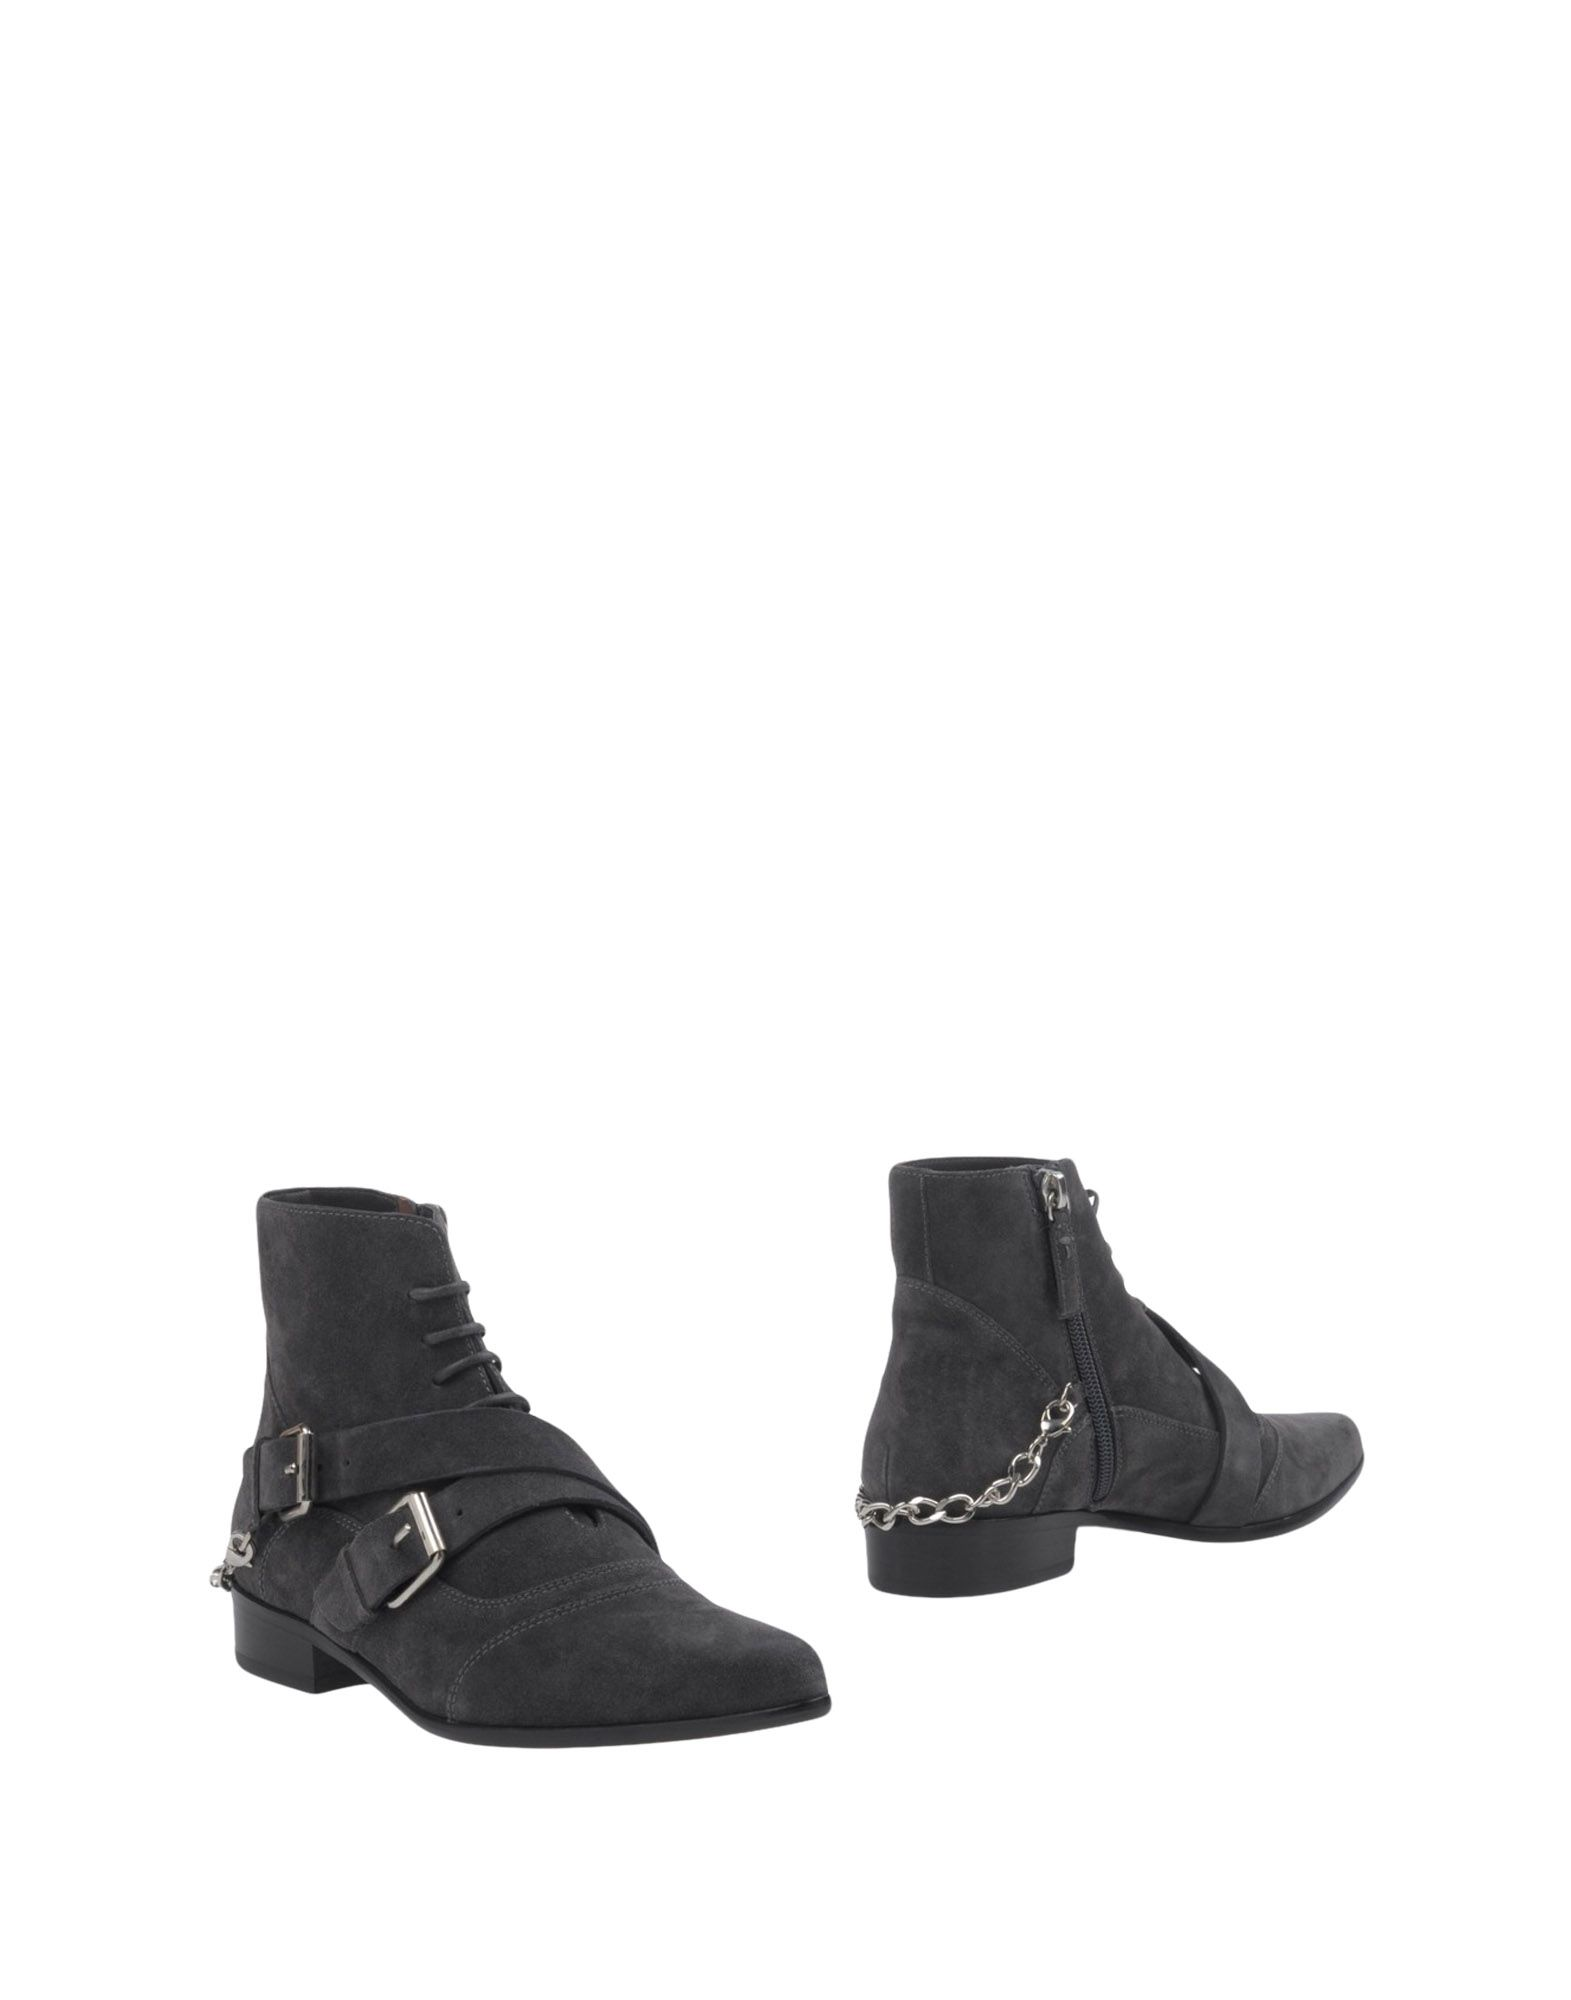 Tabitha Simmons strapazierfähige Stiefelette Damen  11394128EWGut aussehende strapazierfähige Simmons Schuhe 79e7fa